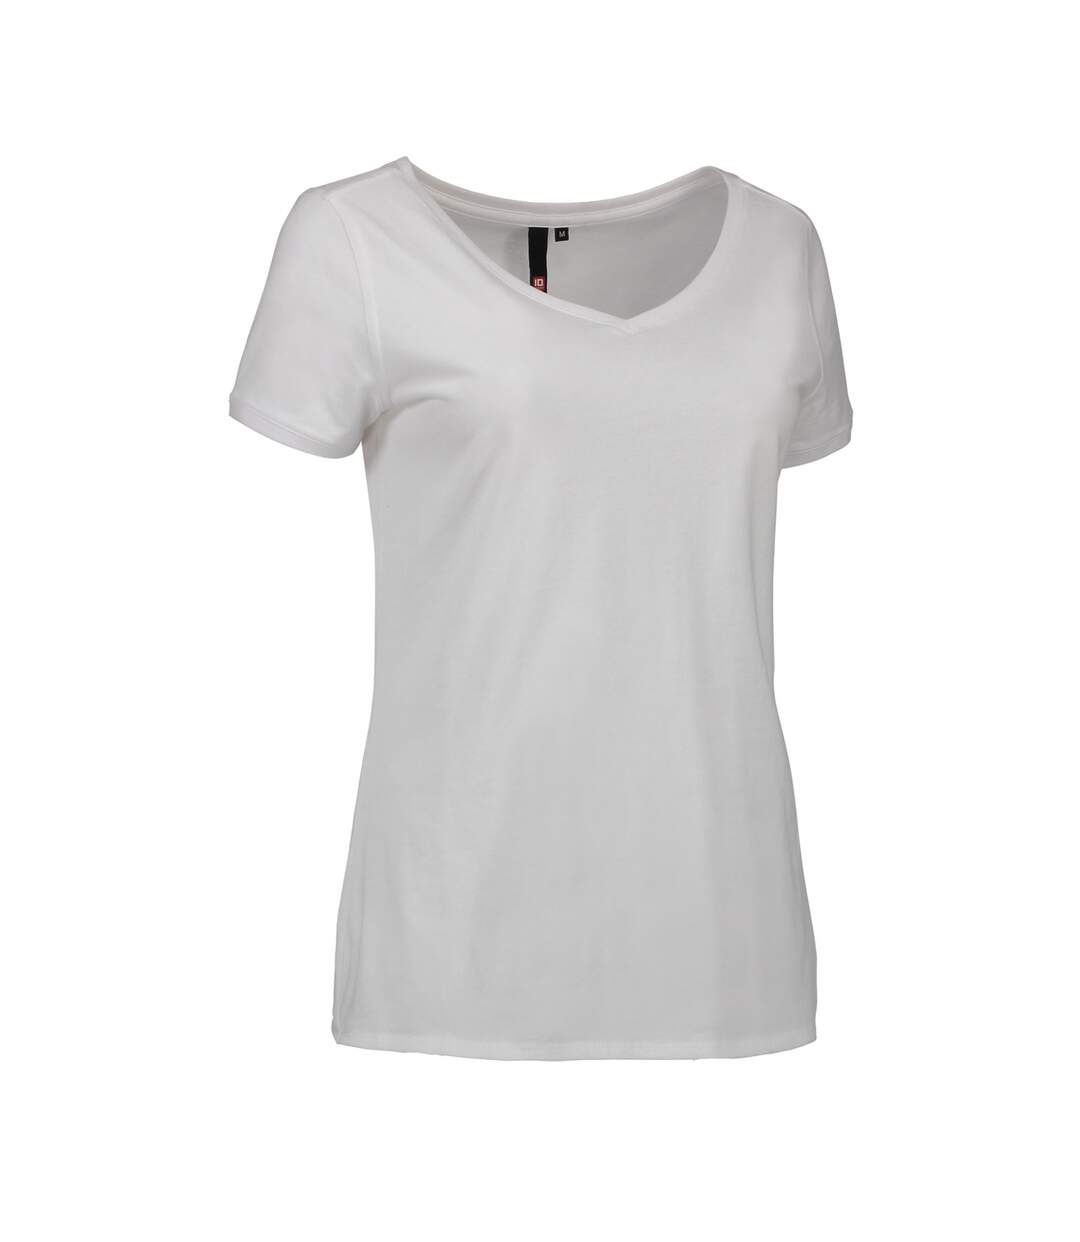 Id Casual - T-Shirt À Col V - Femme (Blanc) - UTID417